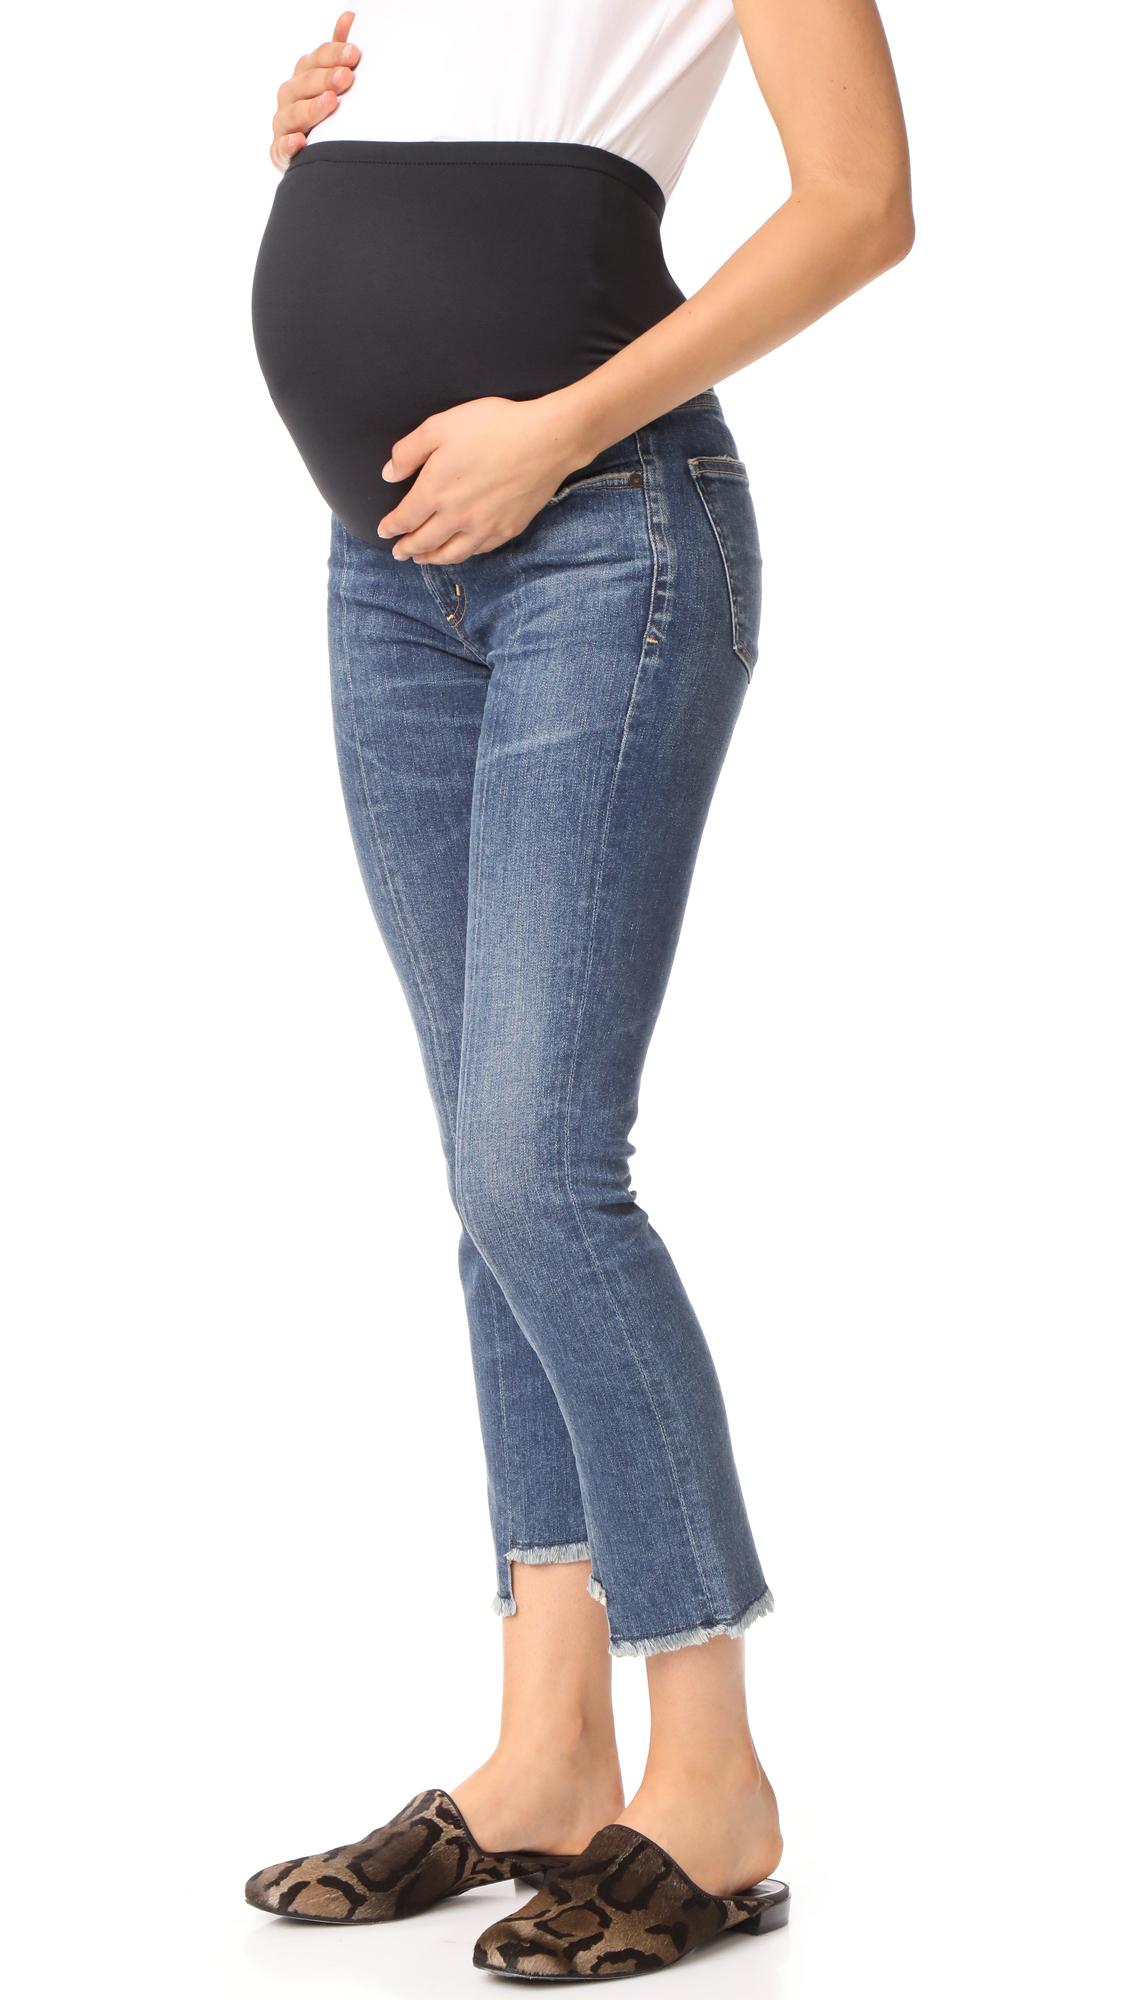 Amari Maternity Jeans